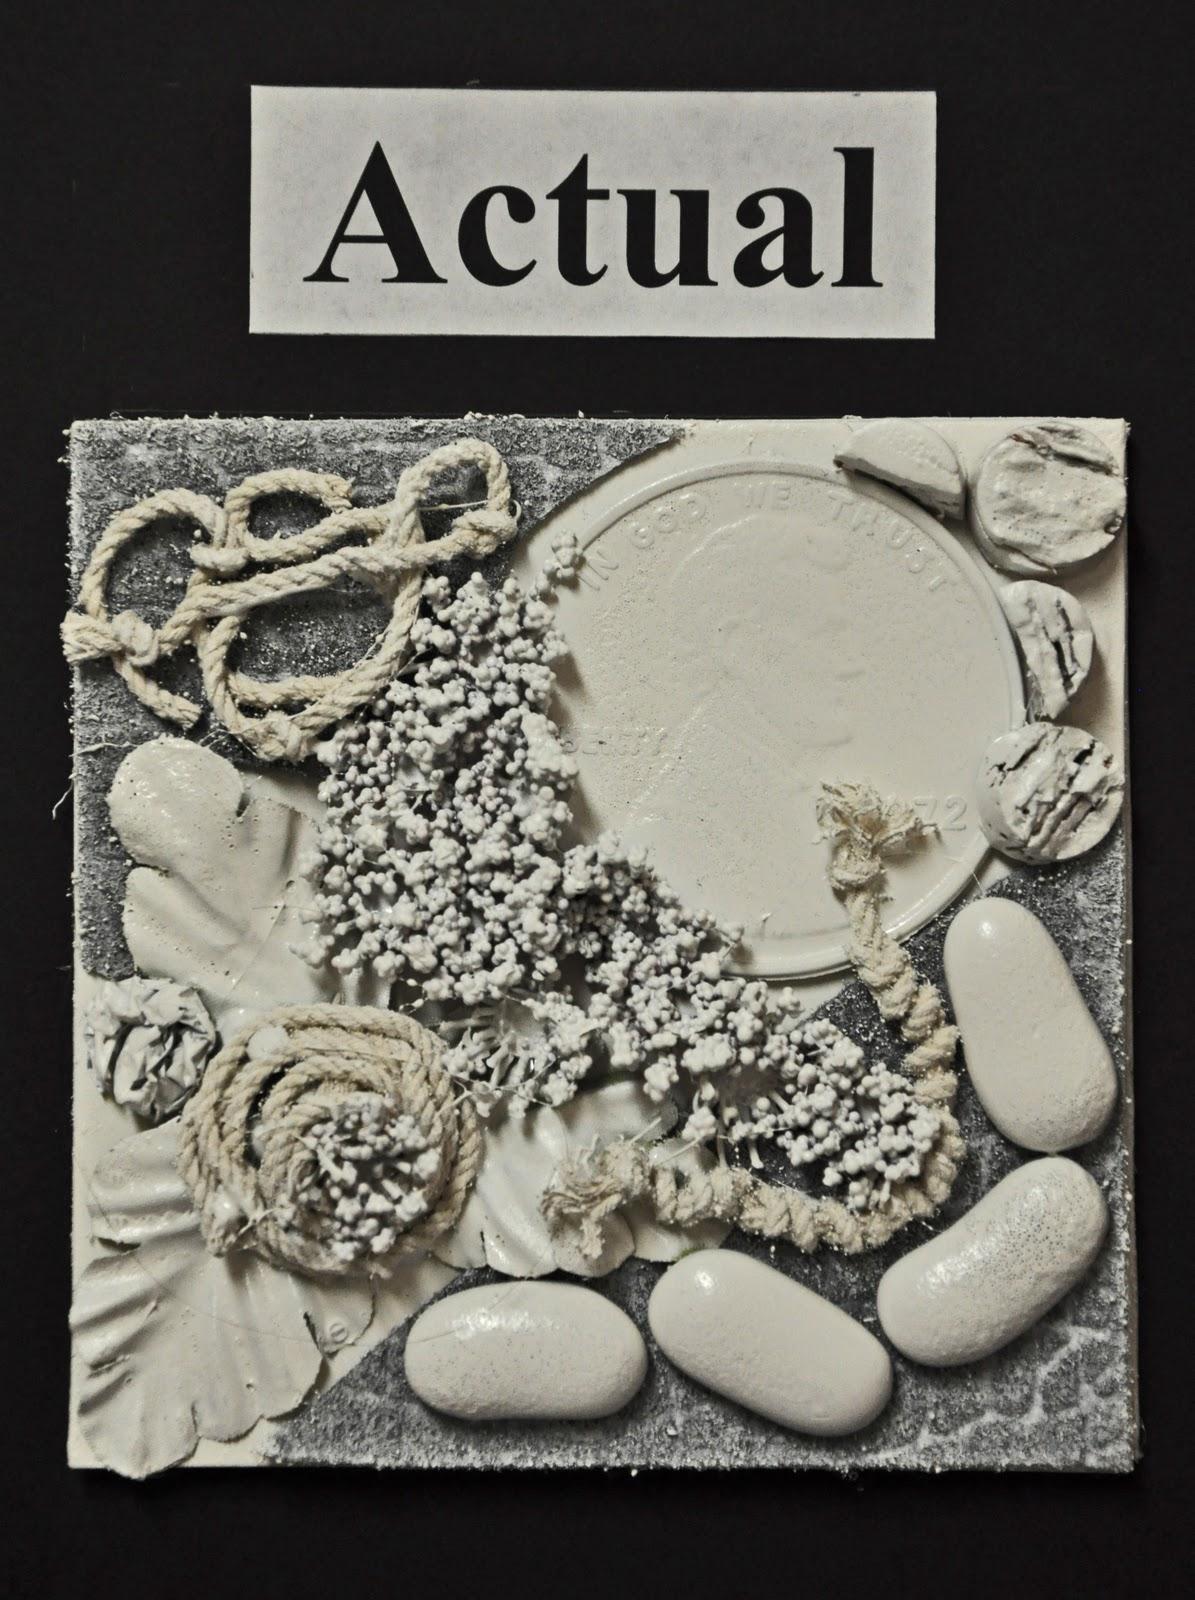 Ana Juan-Gomez: Design 2D: Texture